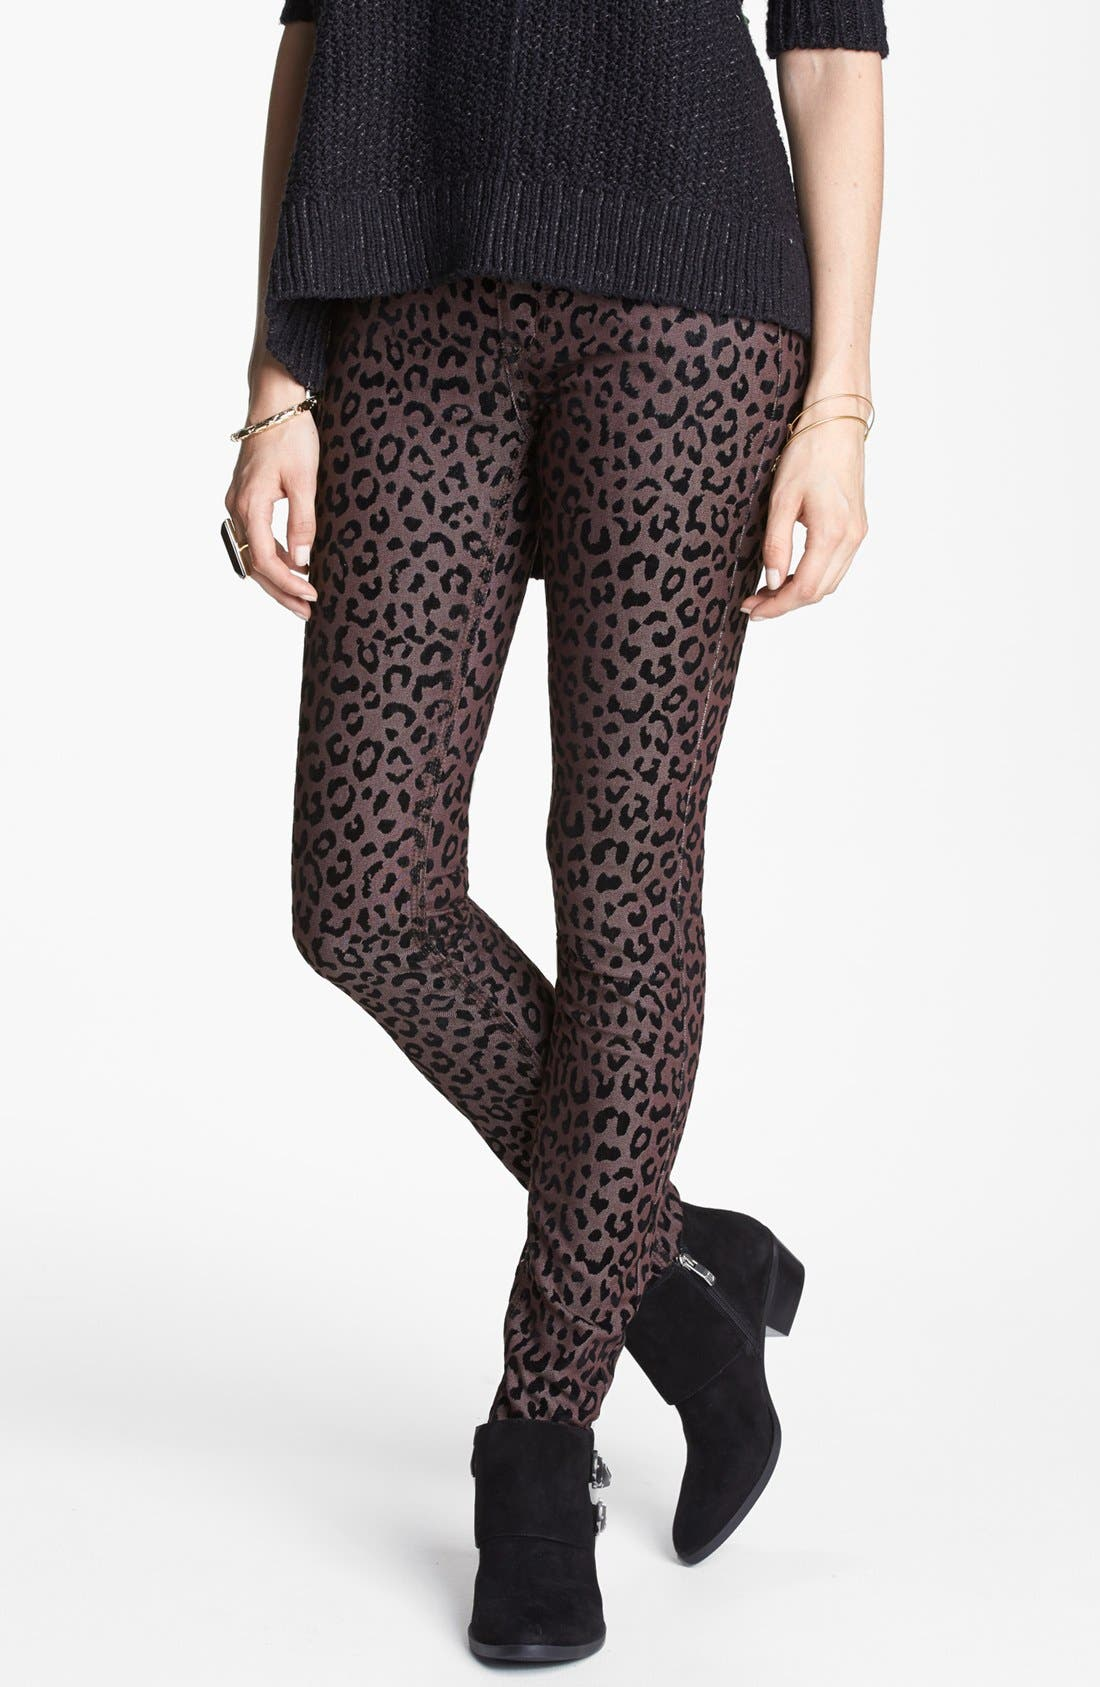 Alternate Image 1 Selected - Free People Leopard Flocked Ankle Pants